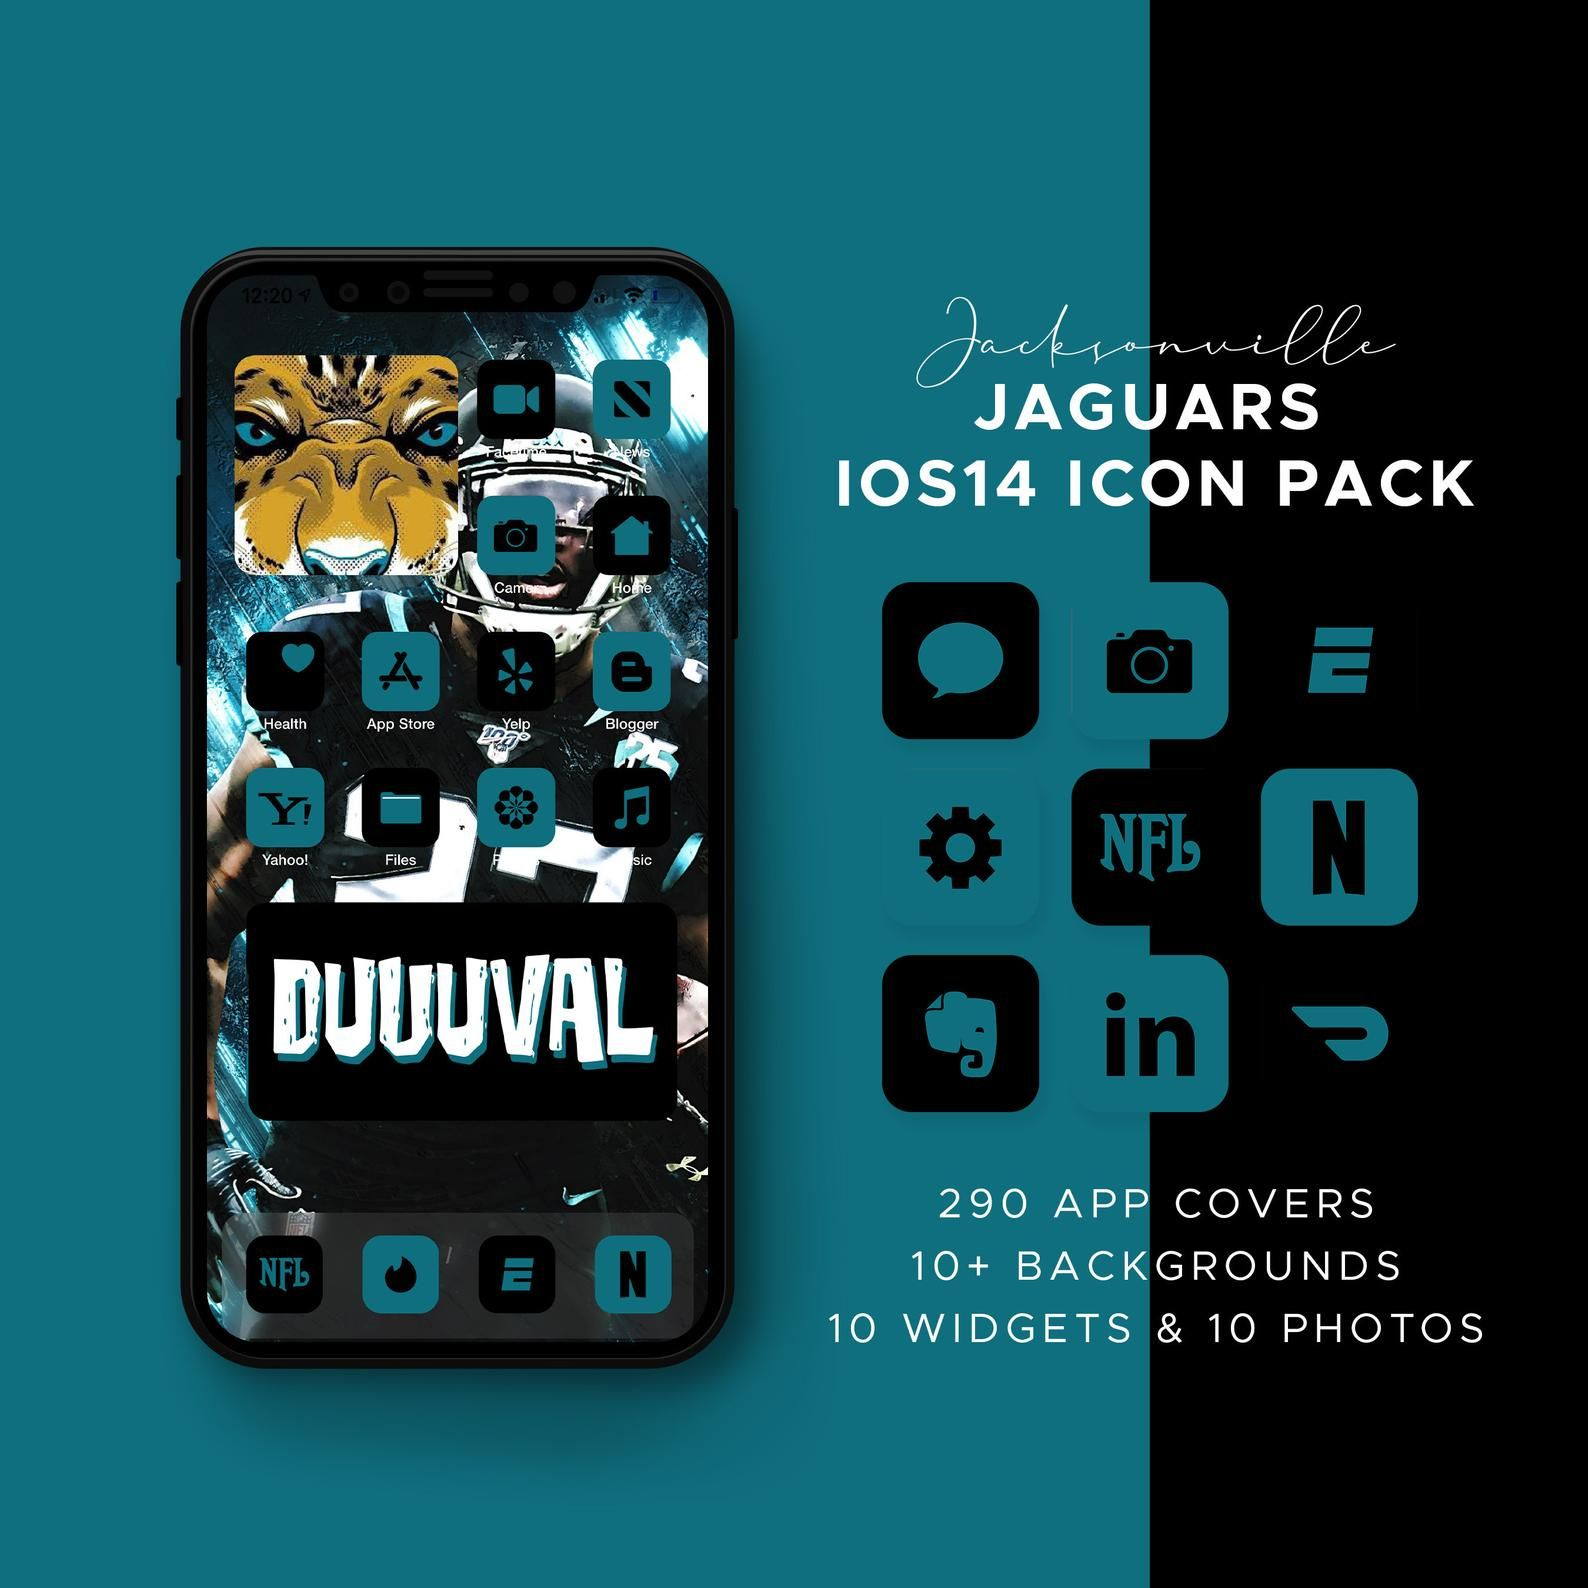 Jacksonville Jaguars Ios14 Icon Theme Pack Ios14 Icons Etsy In 2021 Themes App Ios14 Icon Theme Ios 14